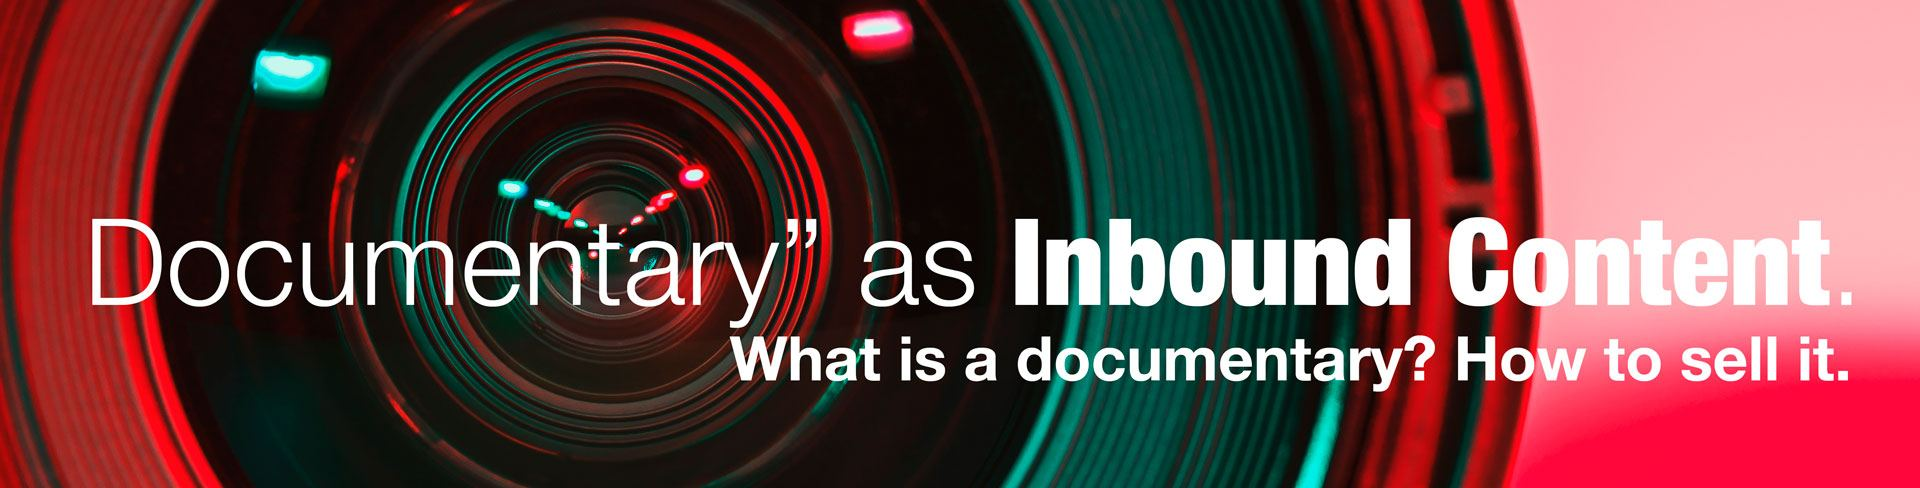 documentary inbound content